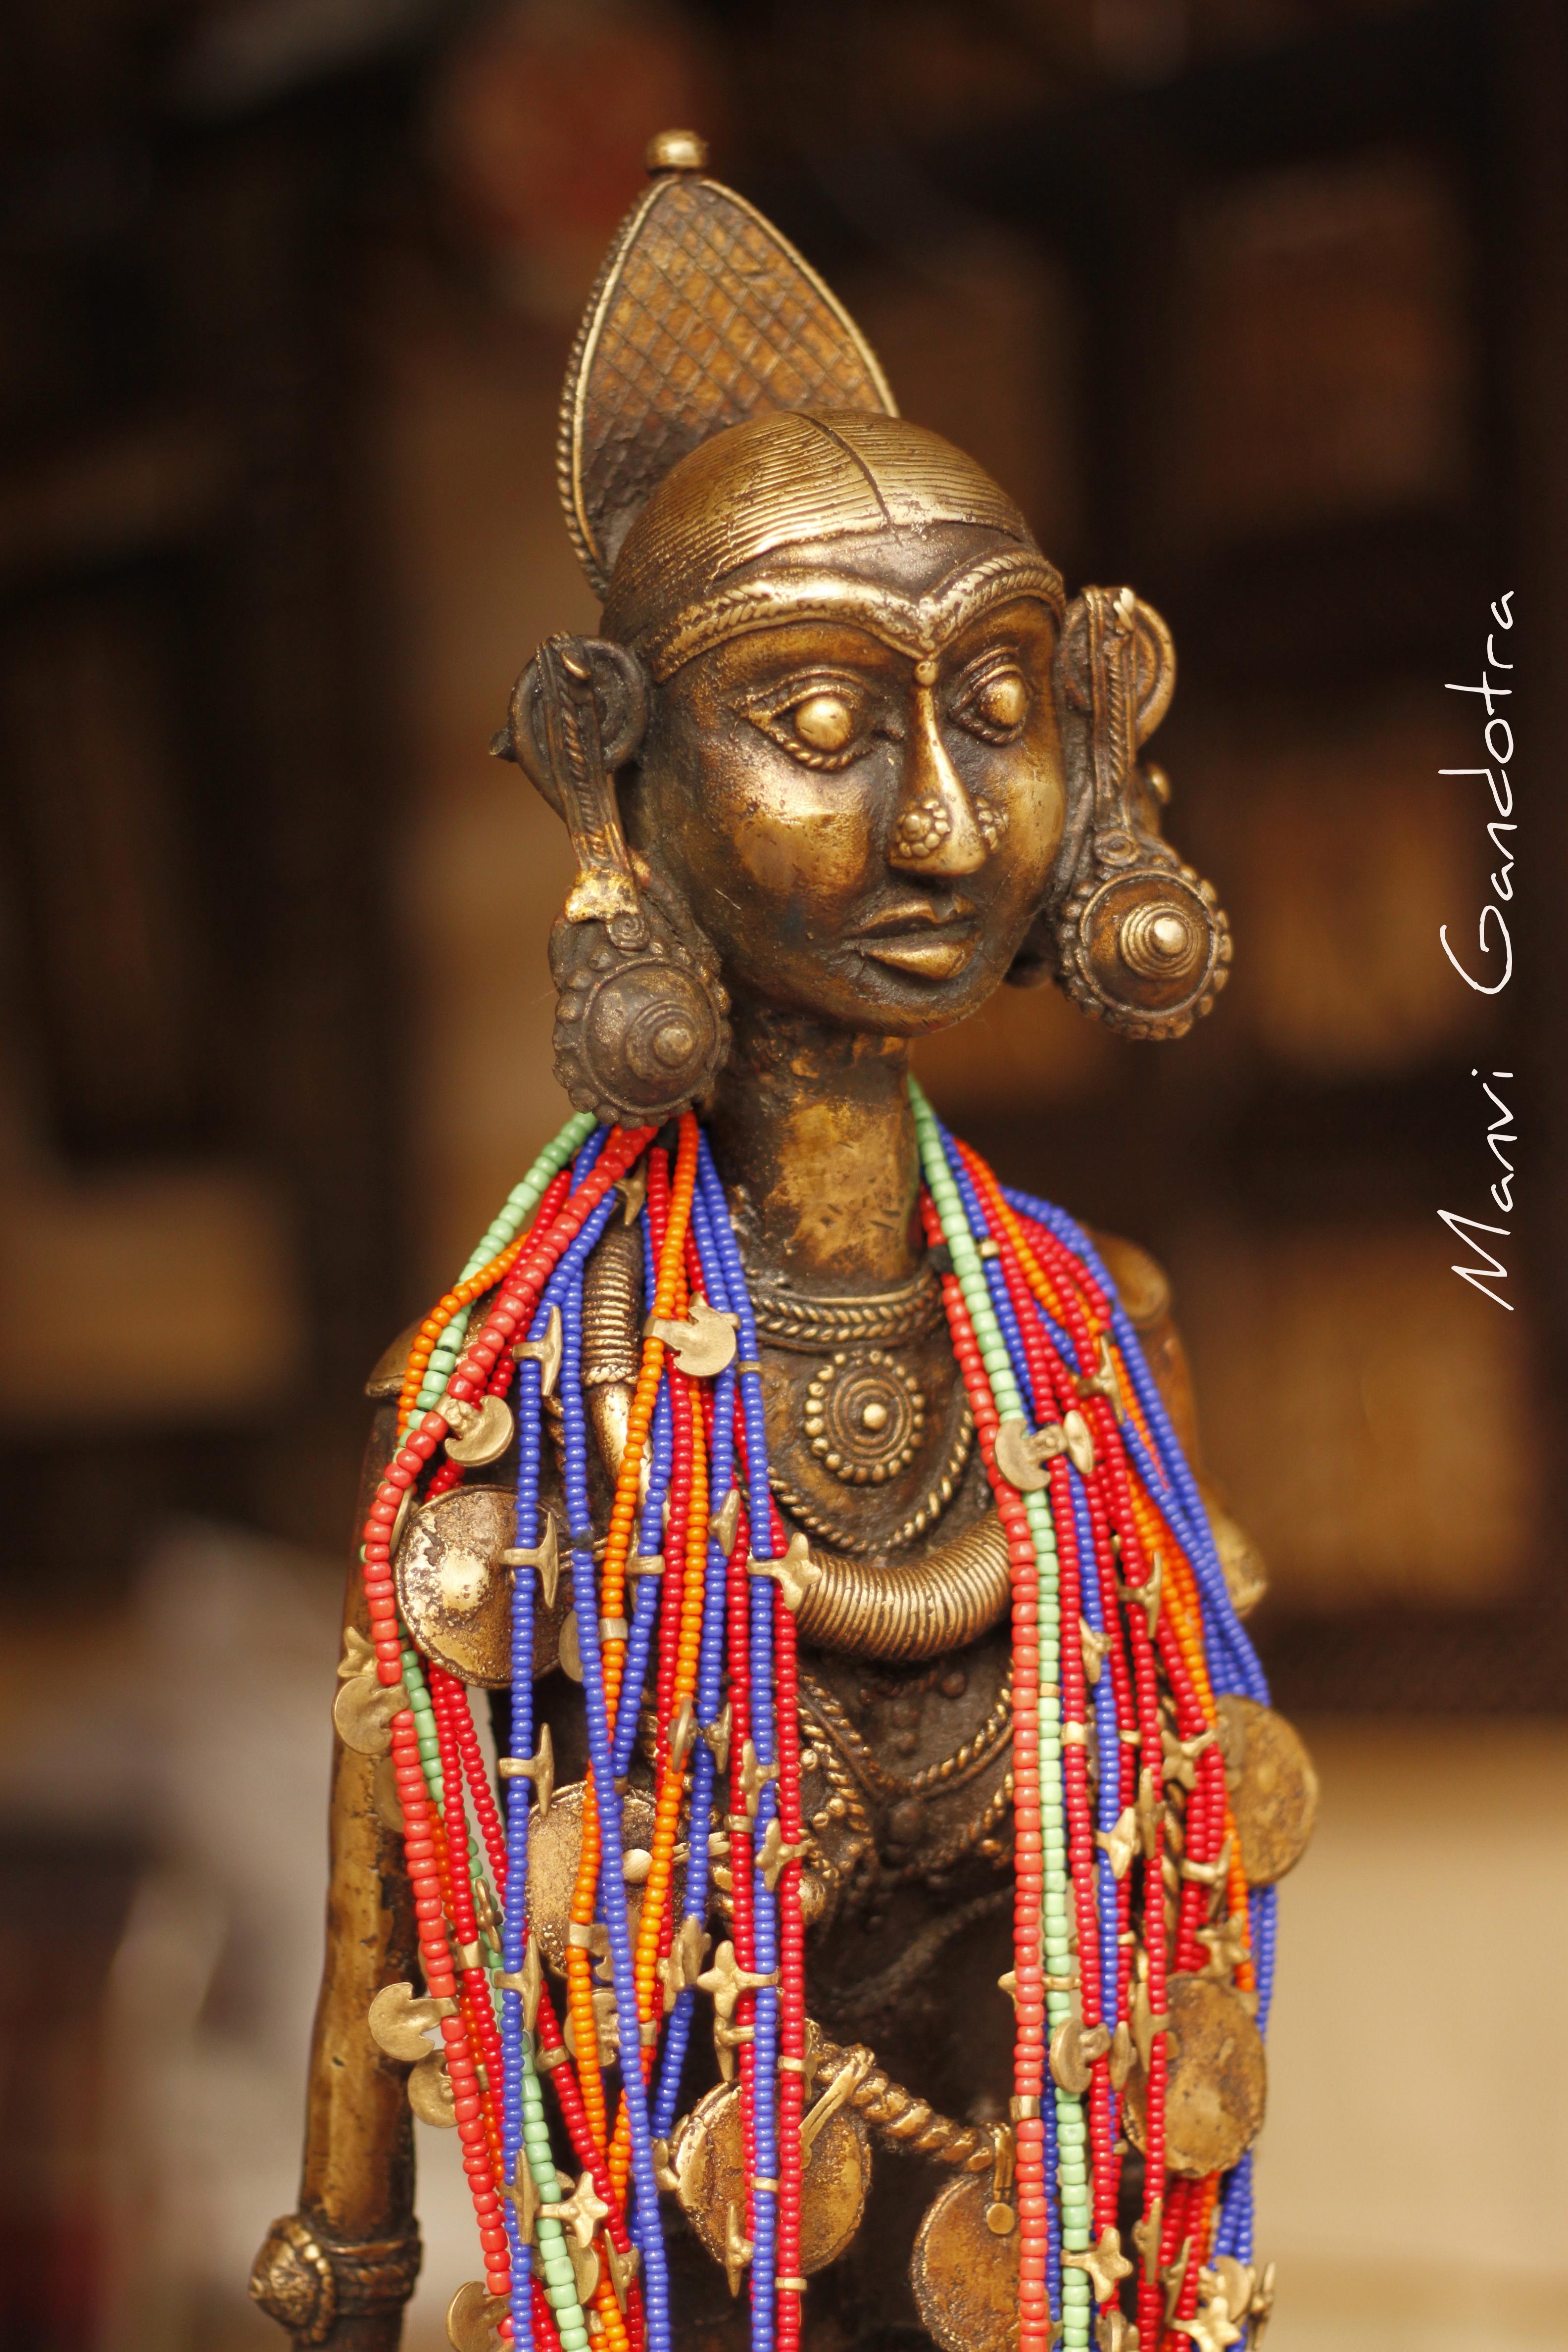 African Tribal Jewellery – Noisy Pilgrims